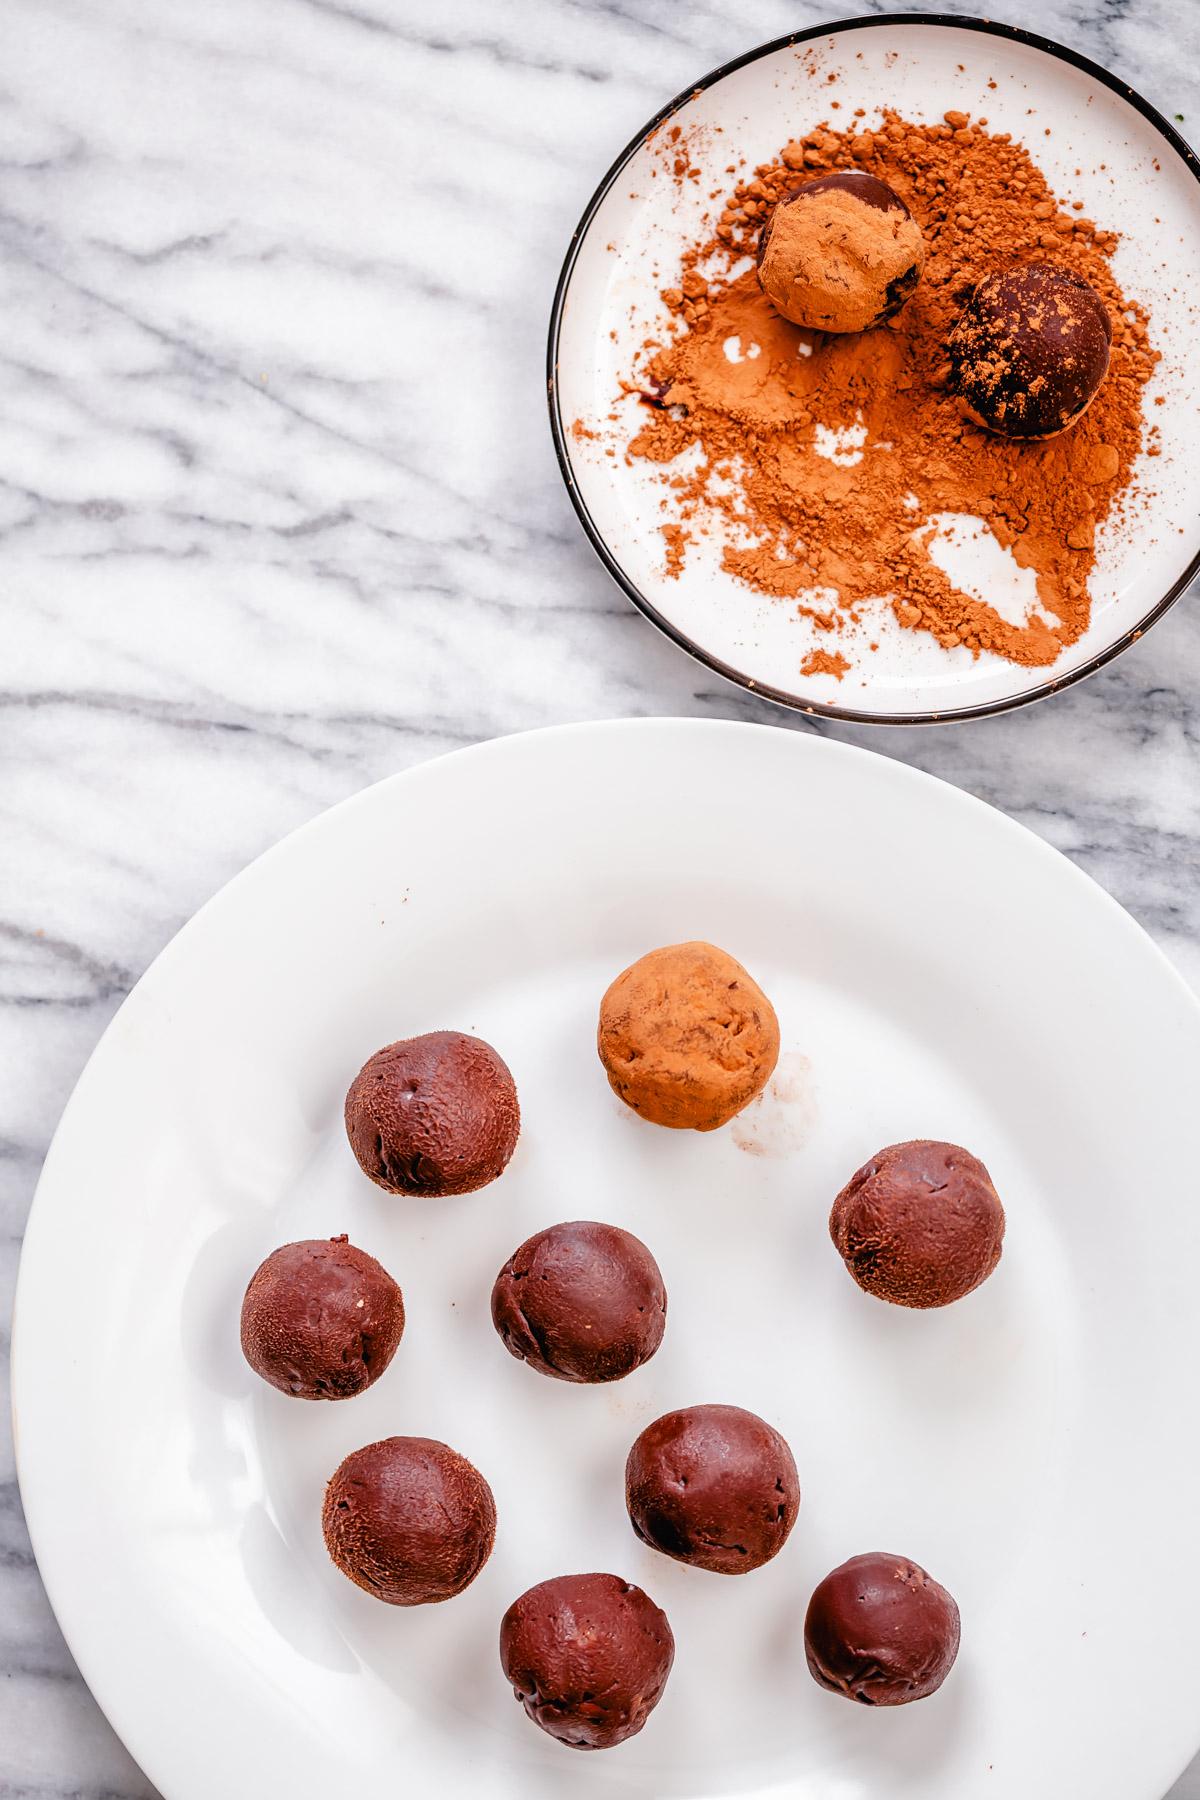 vegan tiramisu truffles being rolled in cocoa powder